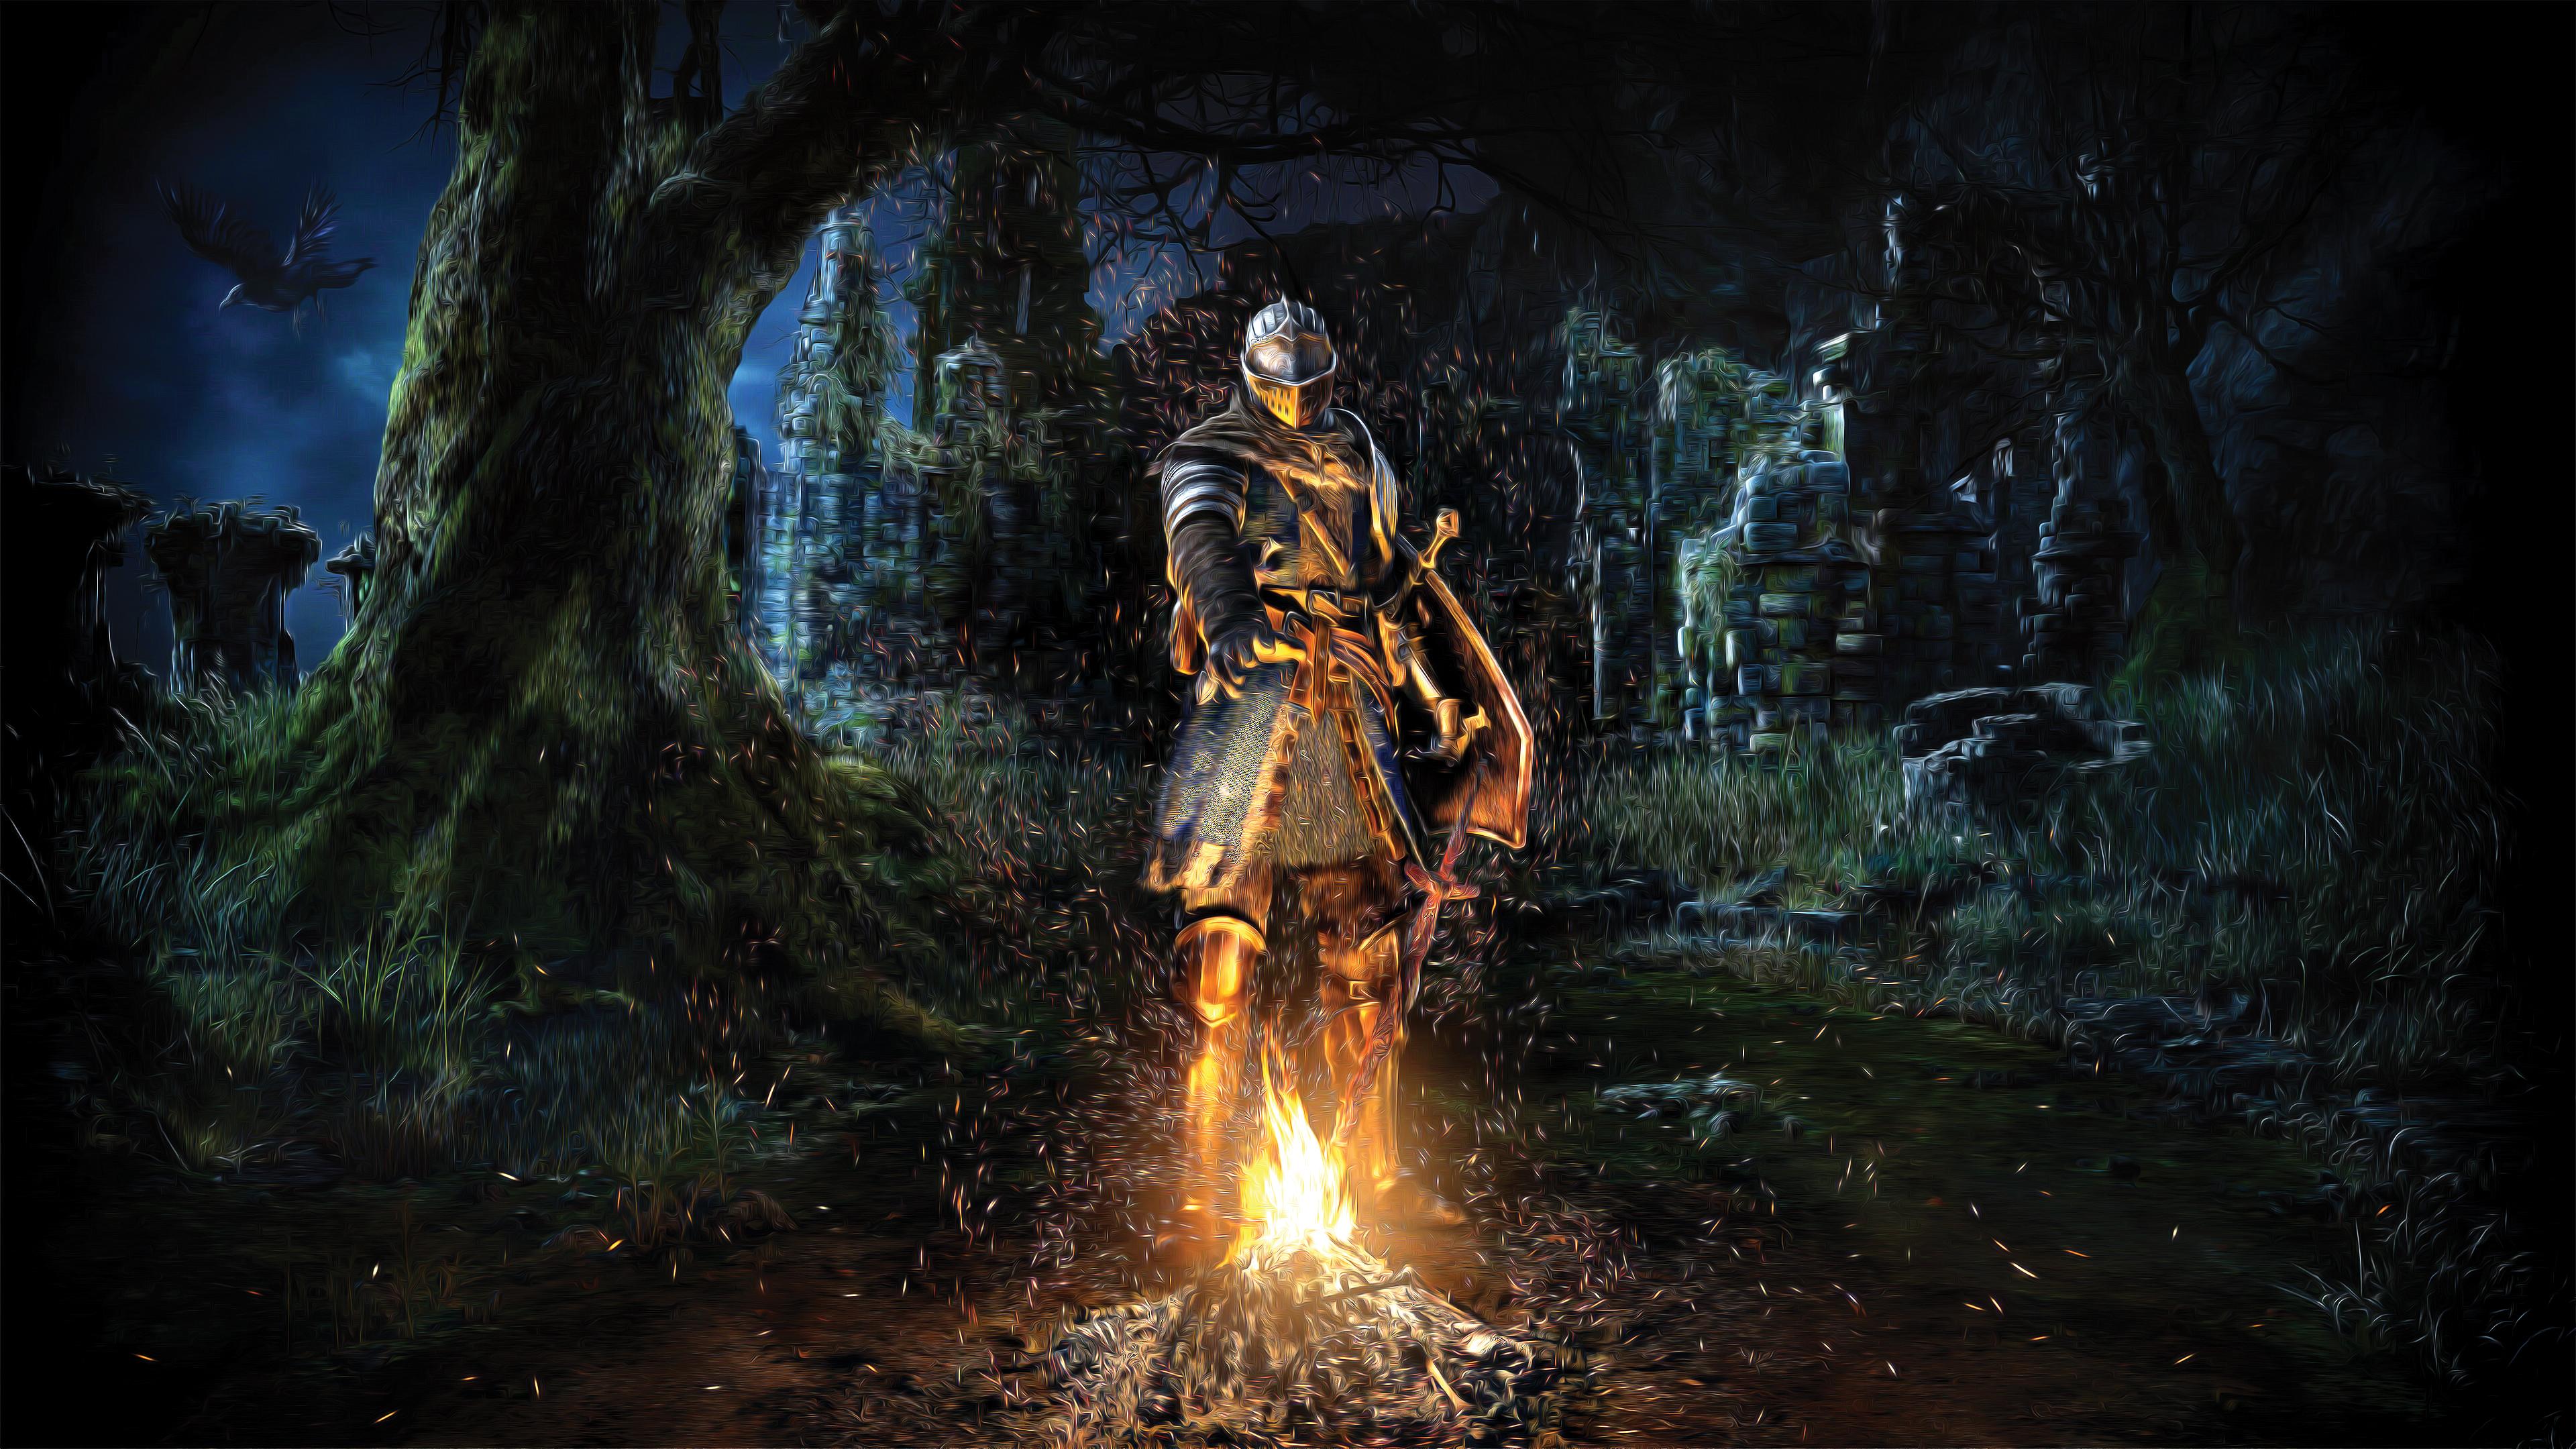 Dark Souls Remastered Art 74839 Hd Wallpaper Backgrounds